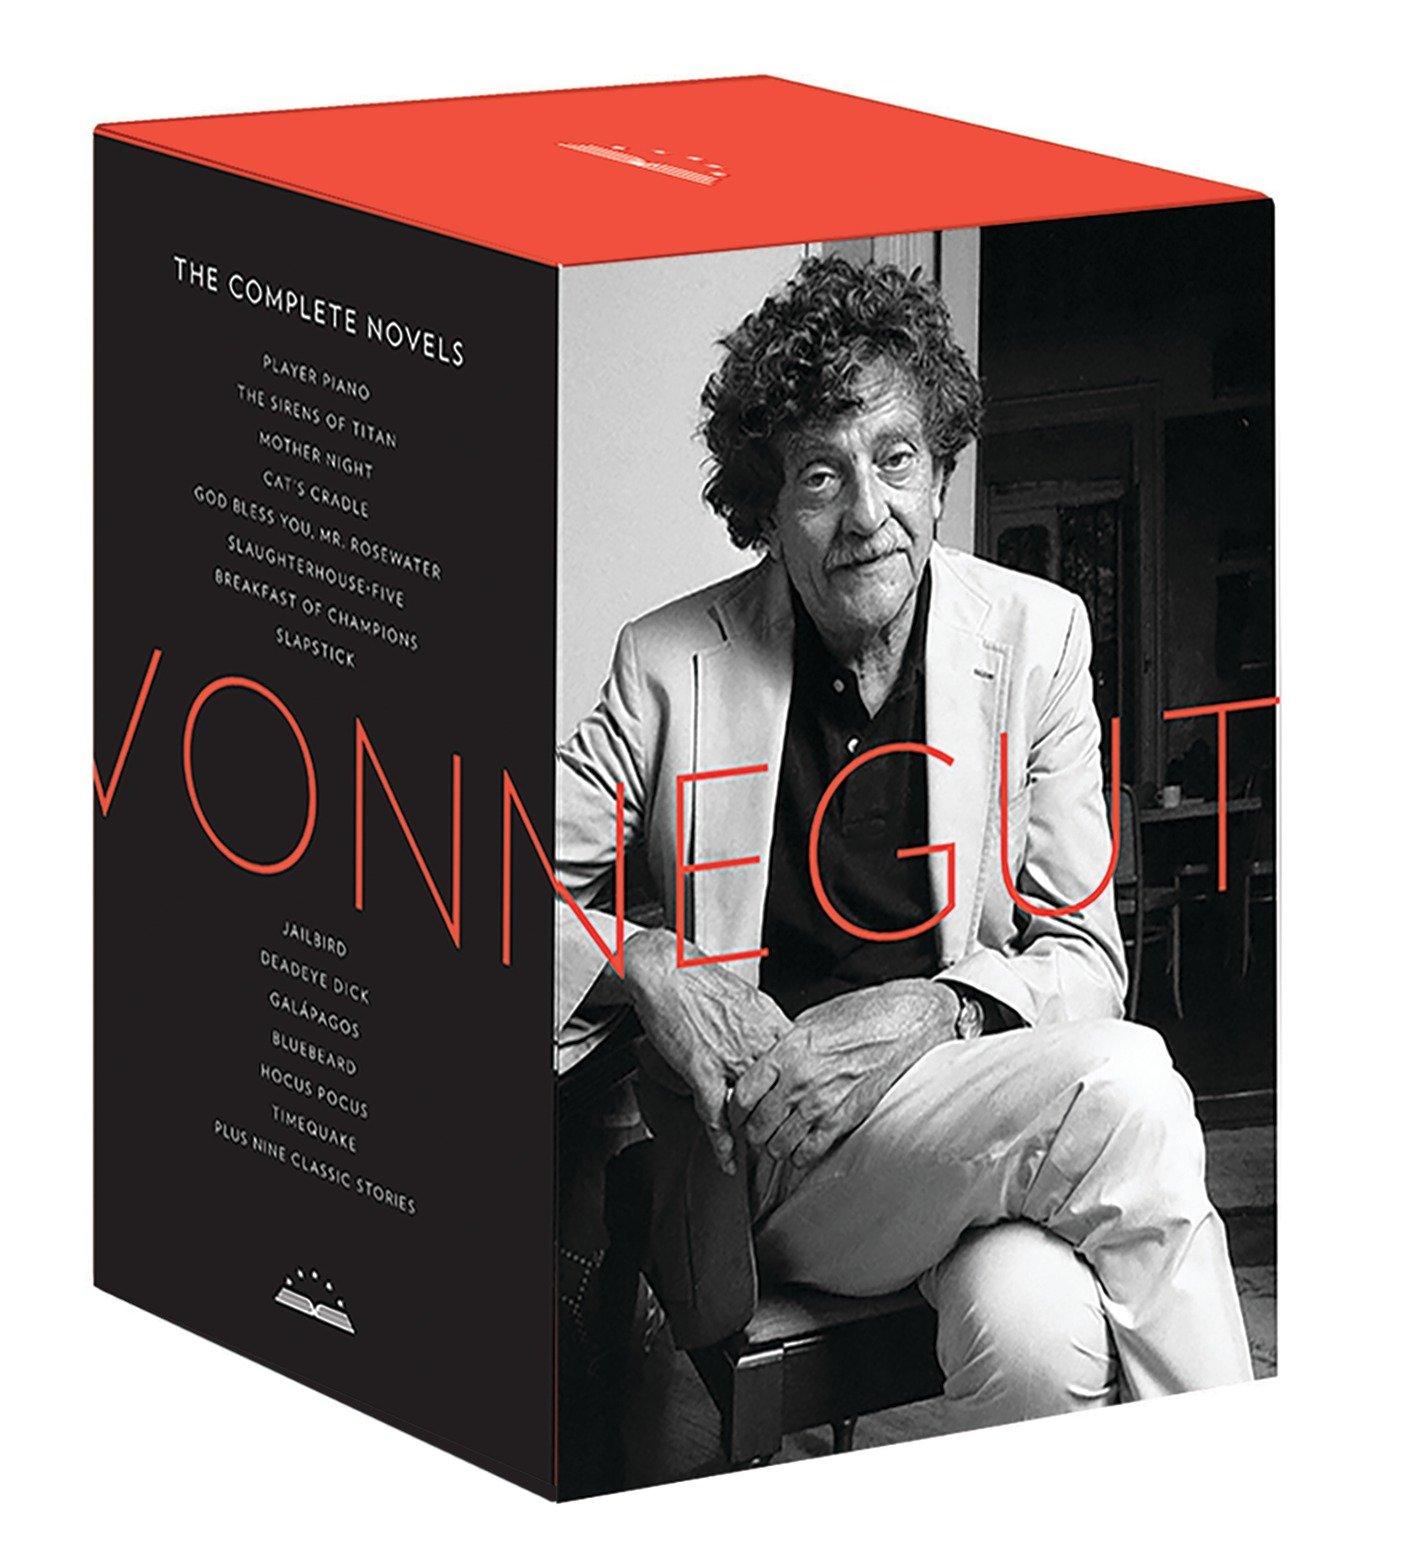 Kurt Vonnegut - Complete Novels hardcover boxed set $65.24 @ Amazon